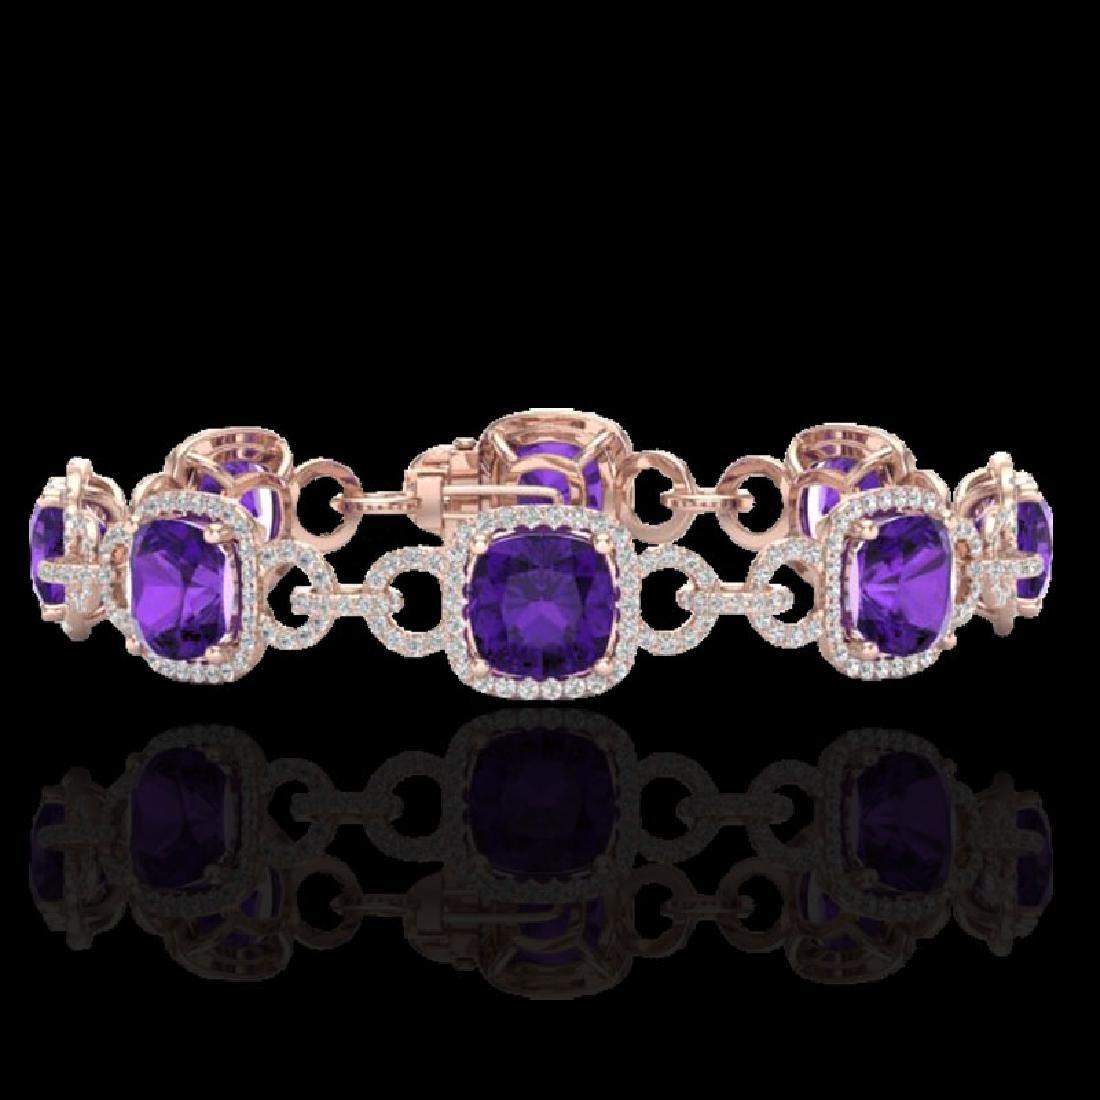 30 CTW Amethyst & Micro VS/SI Diamond Bracelet 14K Rose